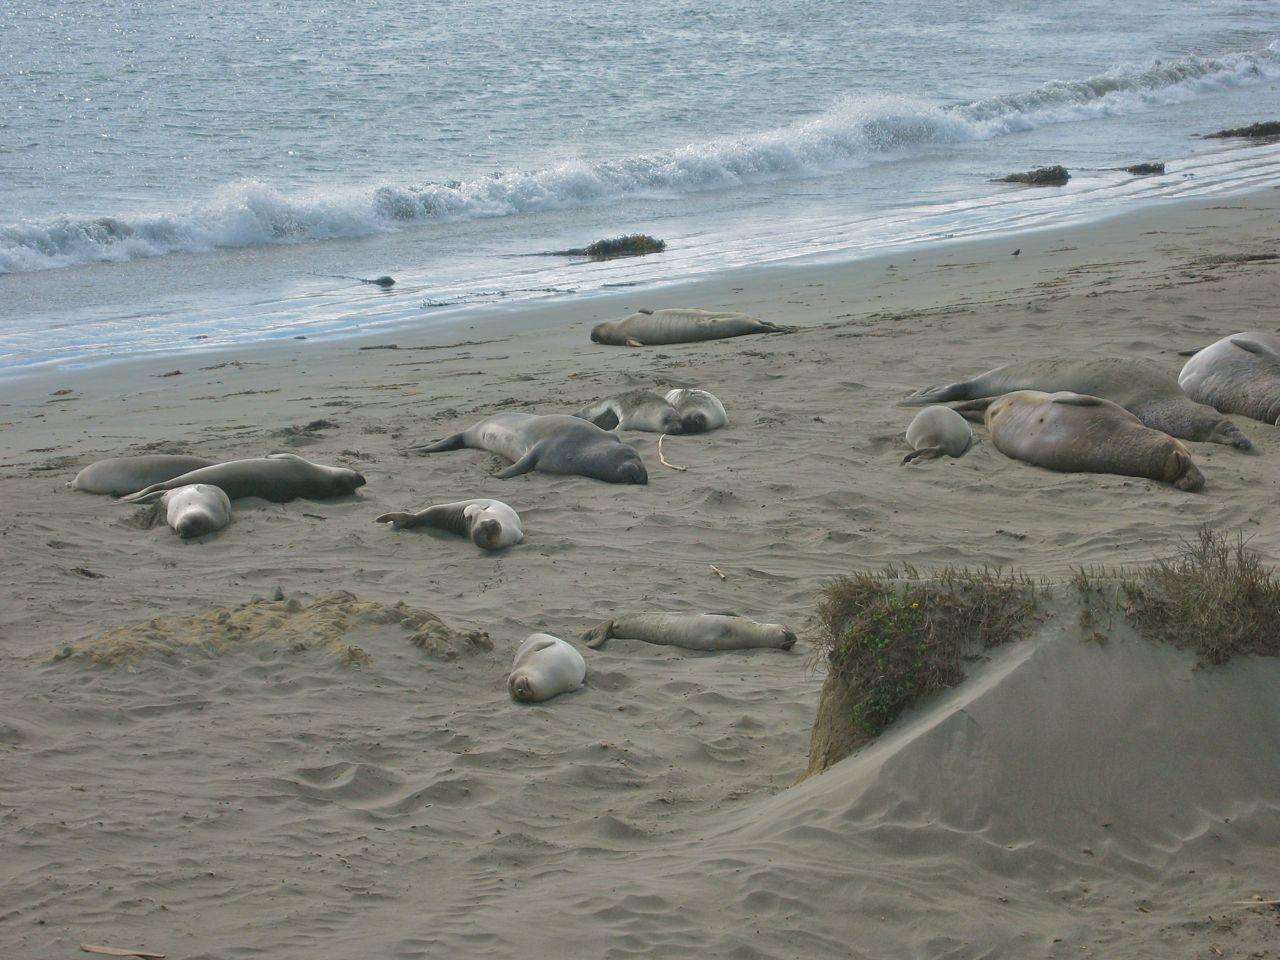 Elephant seals north of Morro Bay